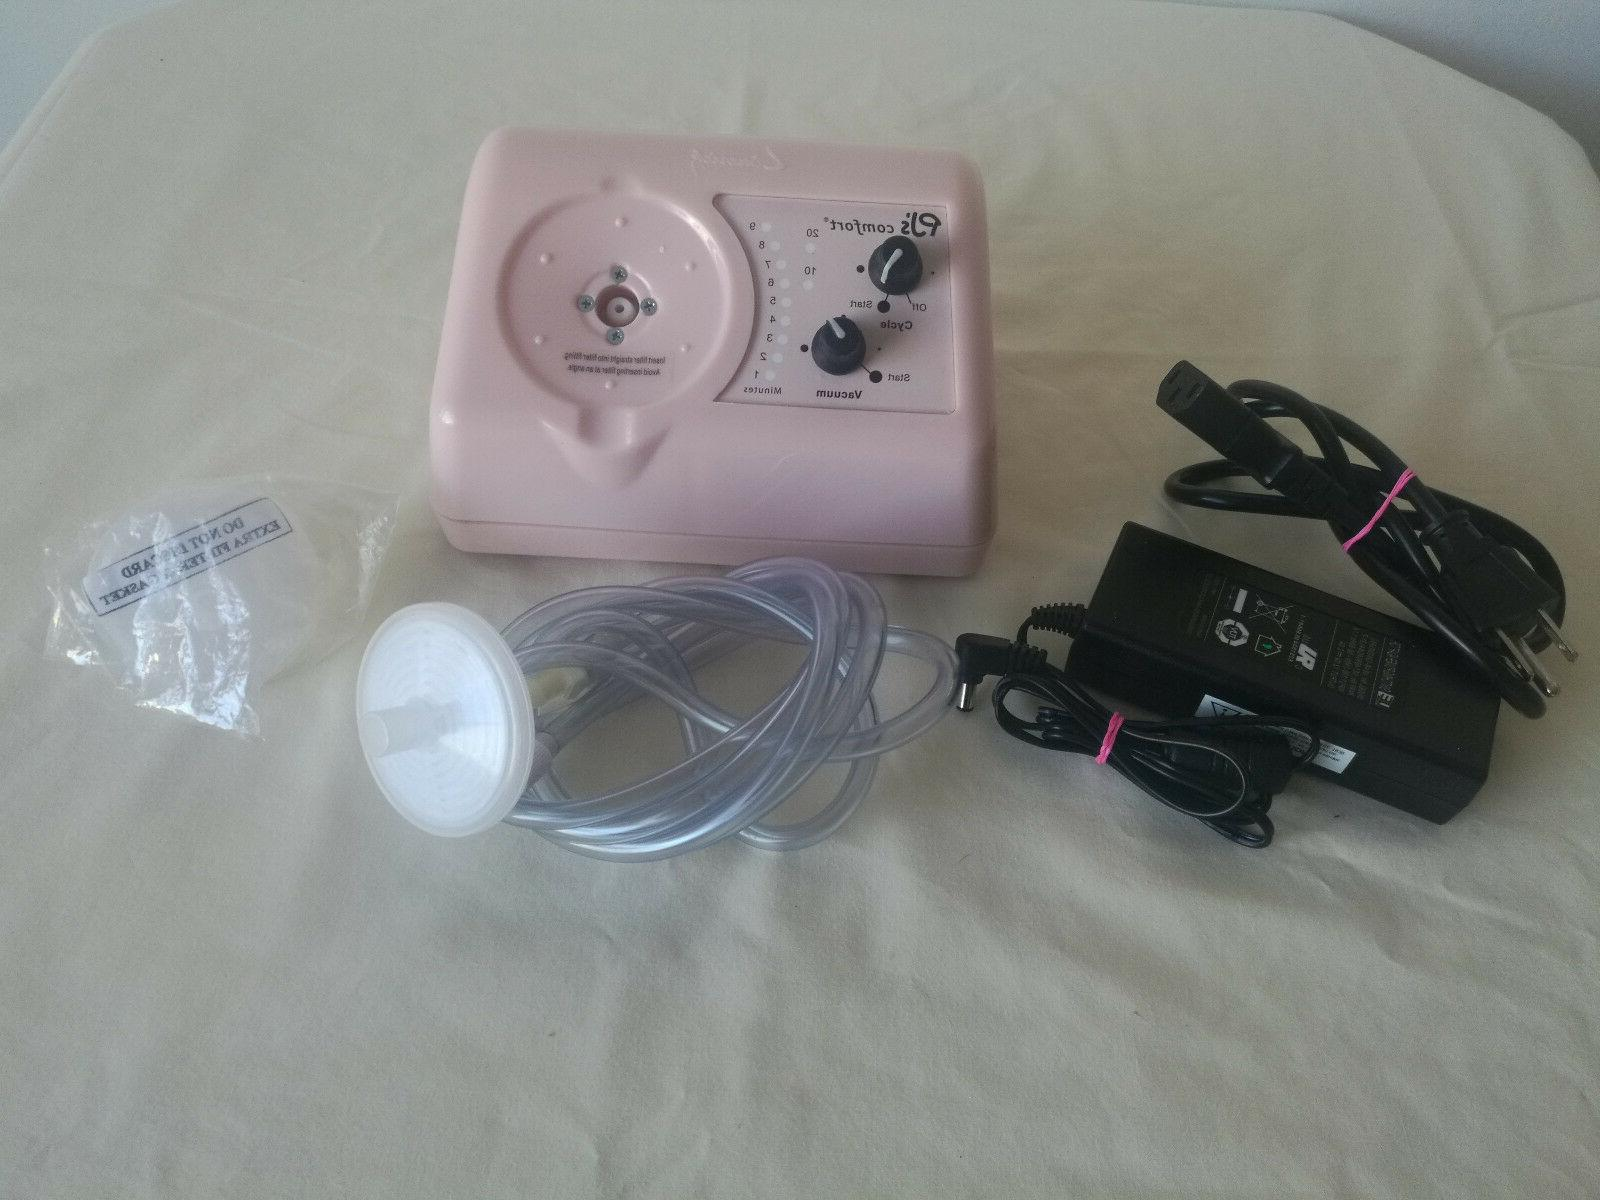 pj s comfort breast pump hospital grade